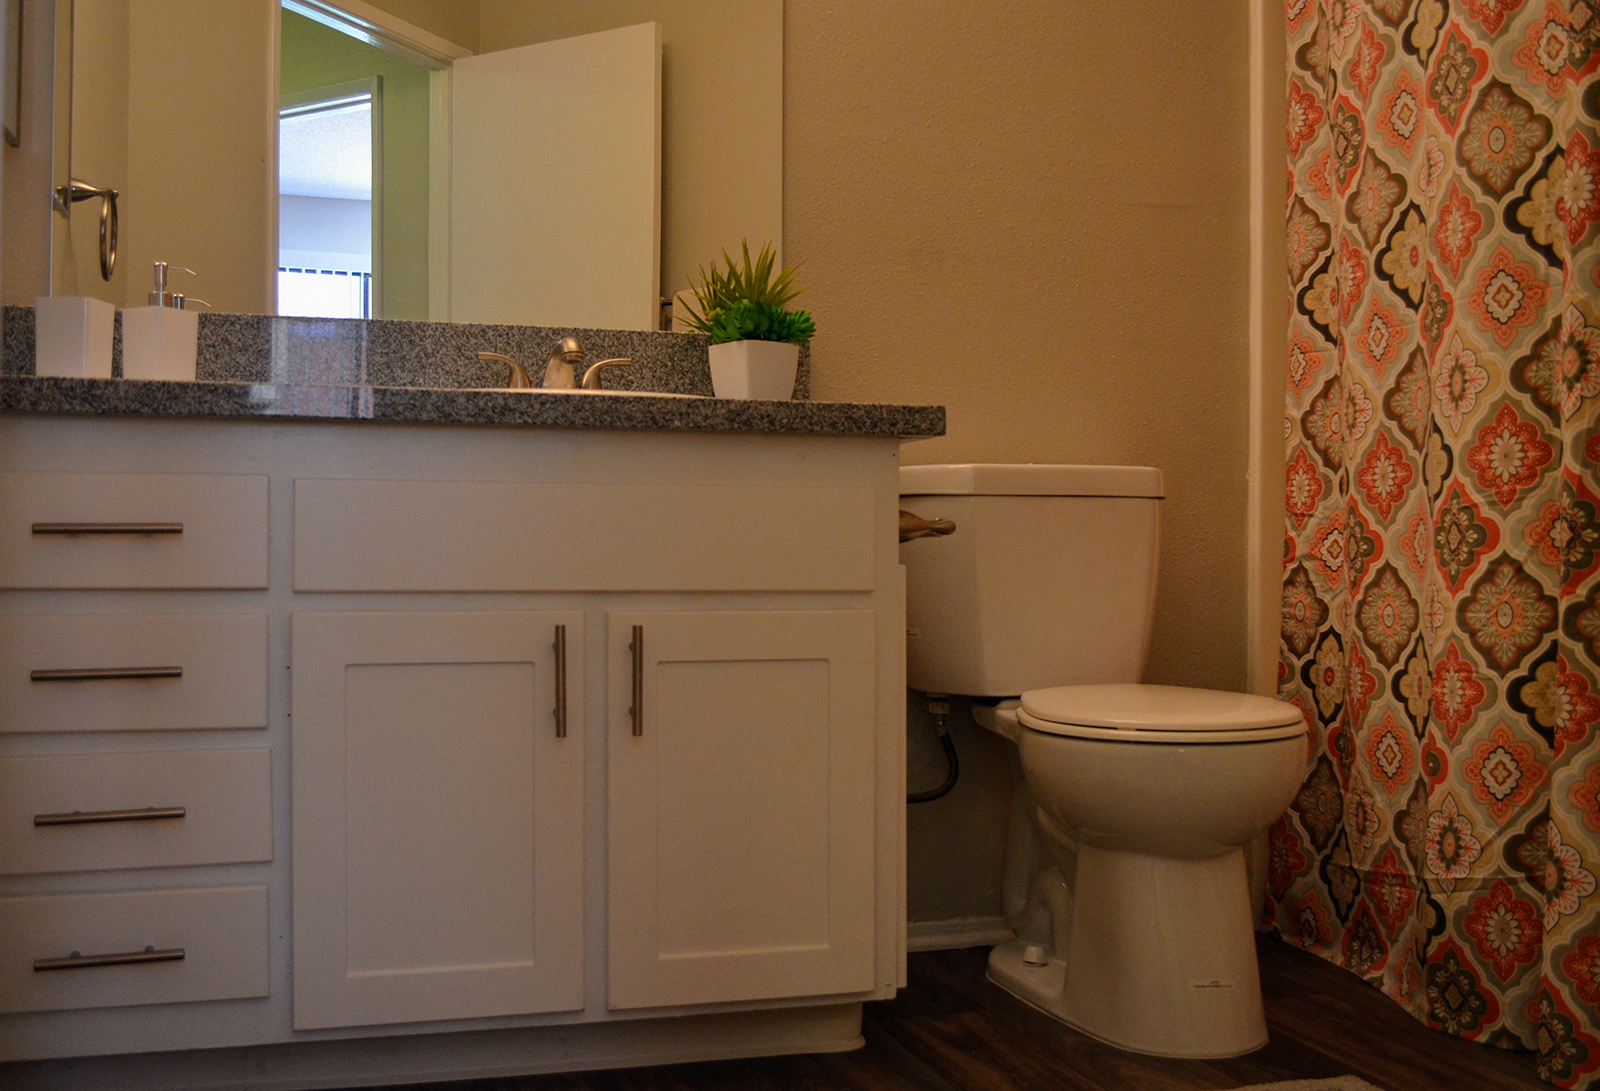 Bathroom at Canyon Villa Apartments, Chula Vista, CA